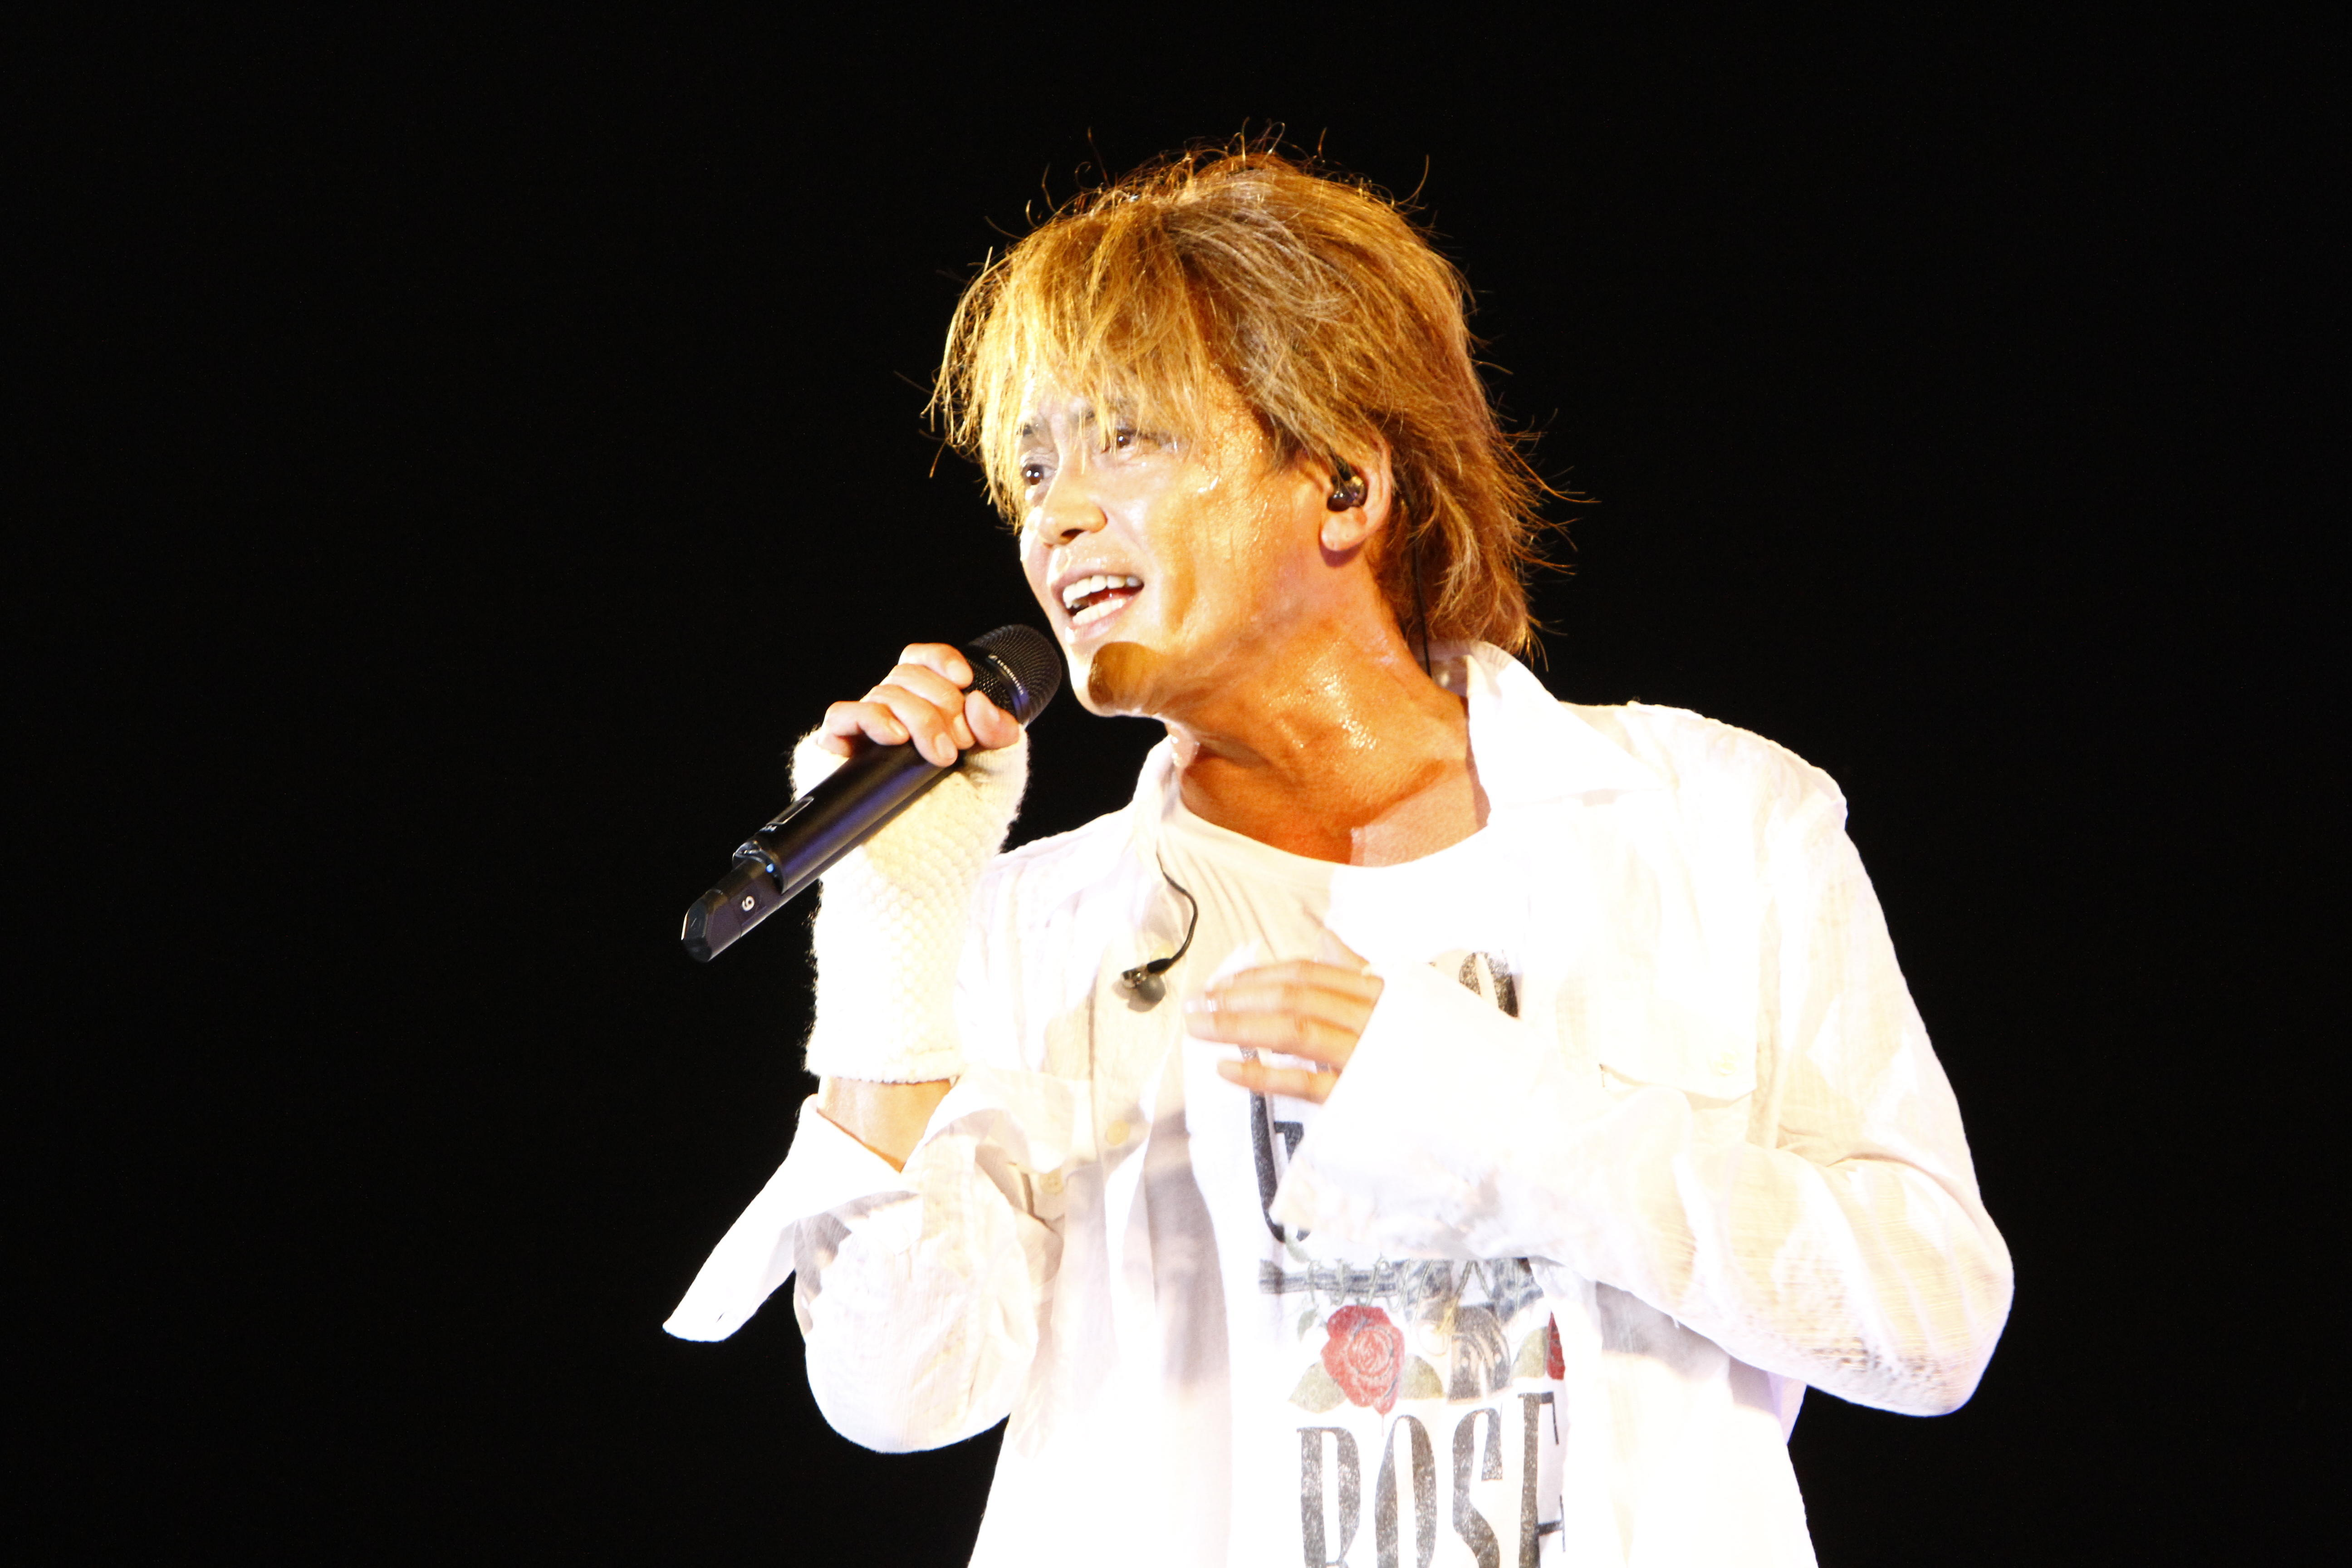 http://news.yoshimoto.co.jp/20170807022010-3db53f5e0cc9cfd918ad28627e57c48cbd3c1175.jpg